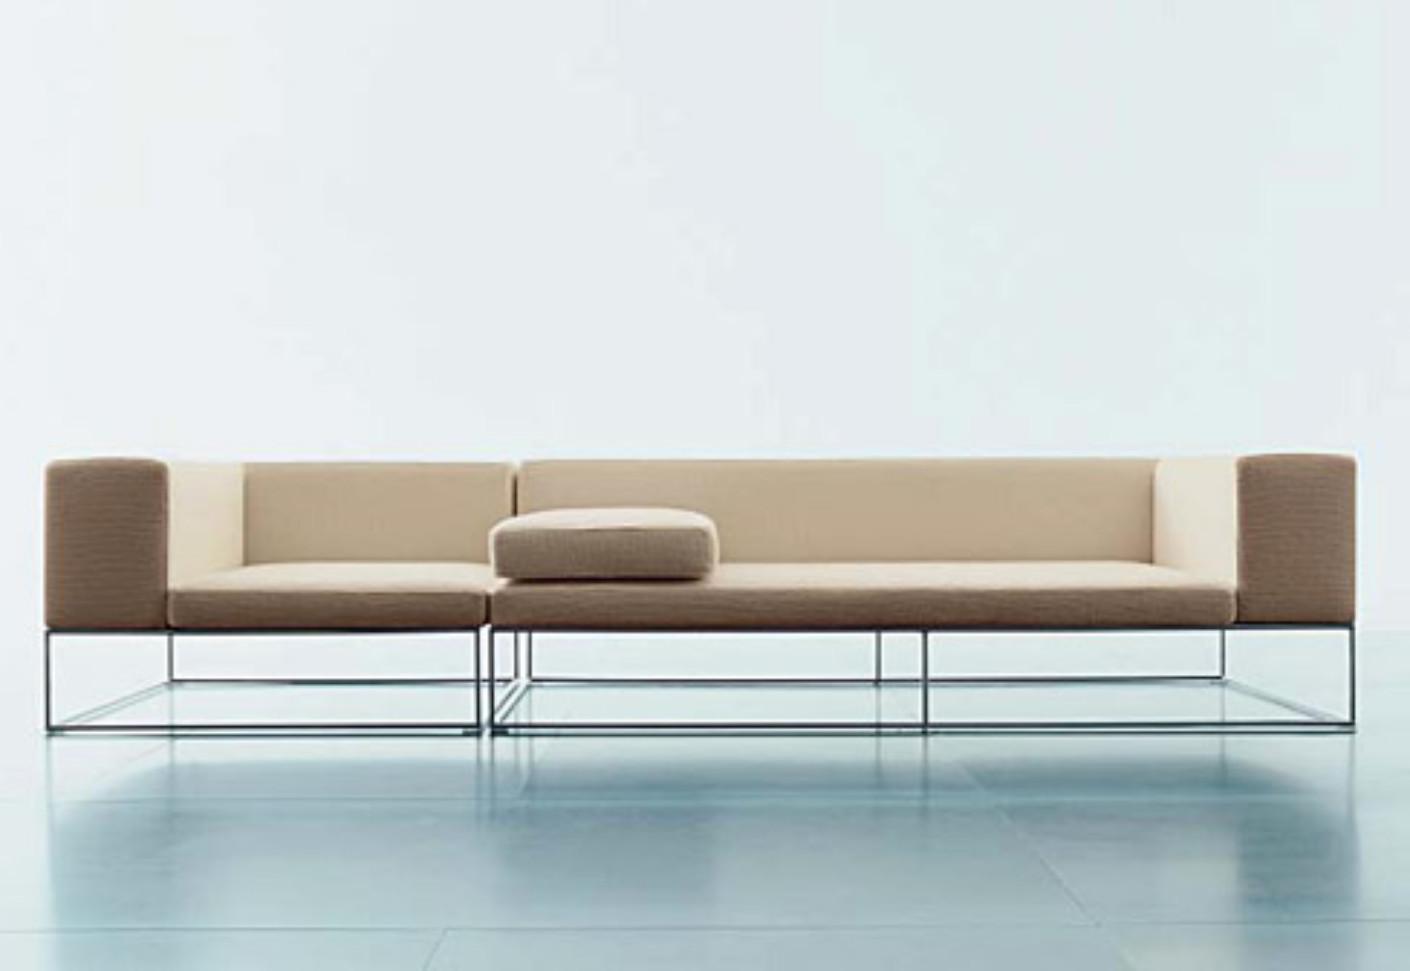 polo divani contemporary leather recliner sofa sitting pretty sofas merry due finest